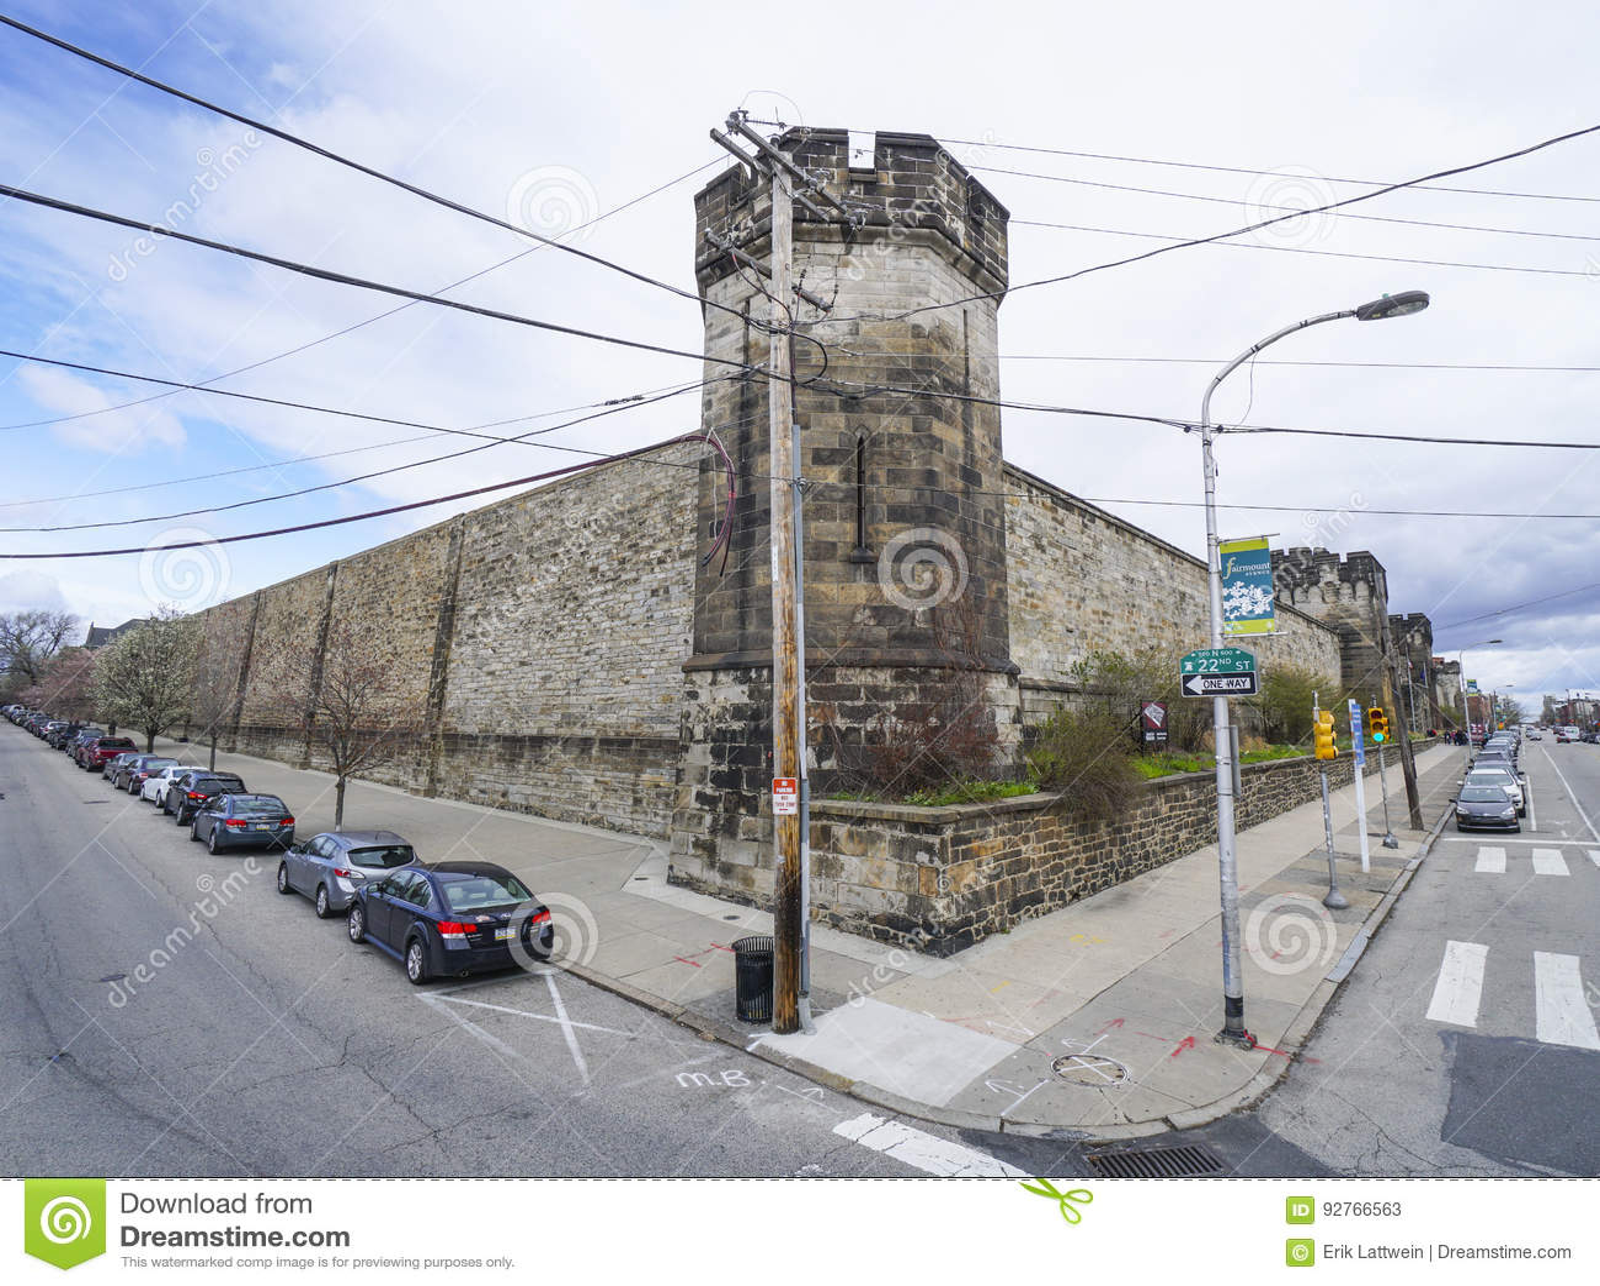 Cárcel del este del estado en Philadelphia - PHILADELPHIA - PENNSYLVANIA - 6 de abril de 2017